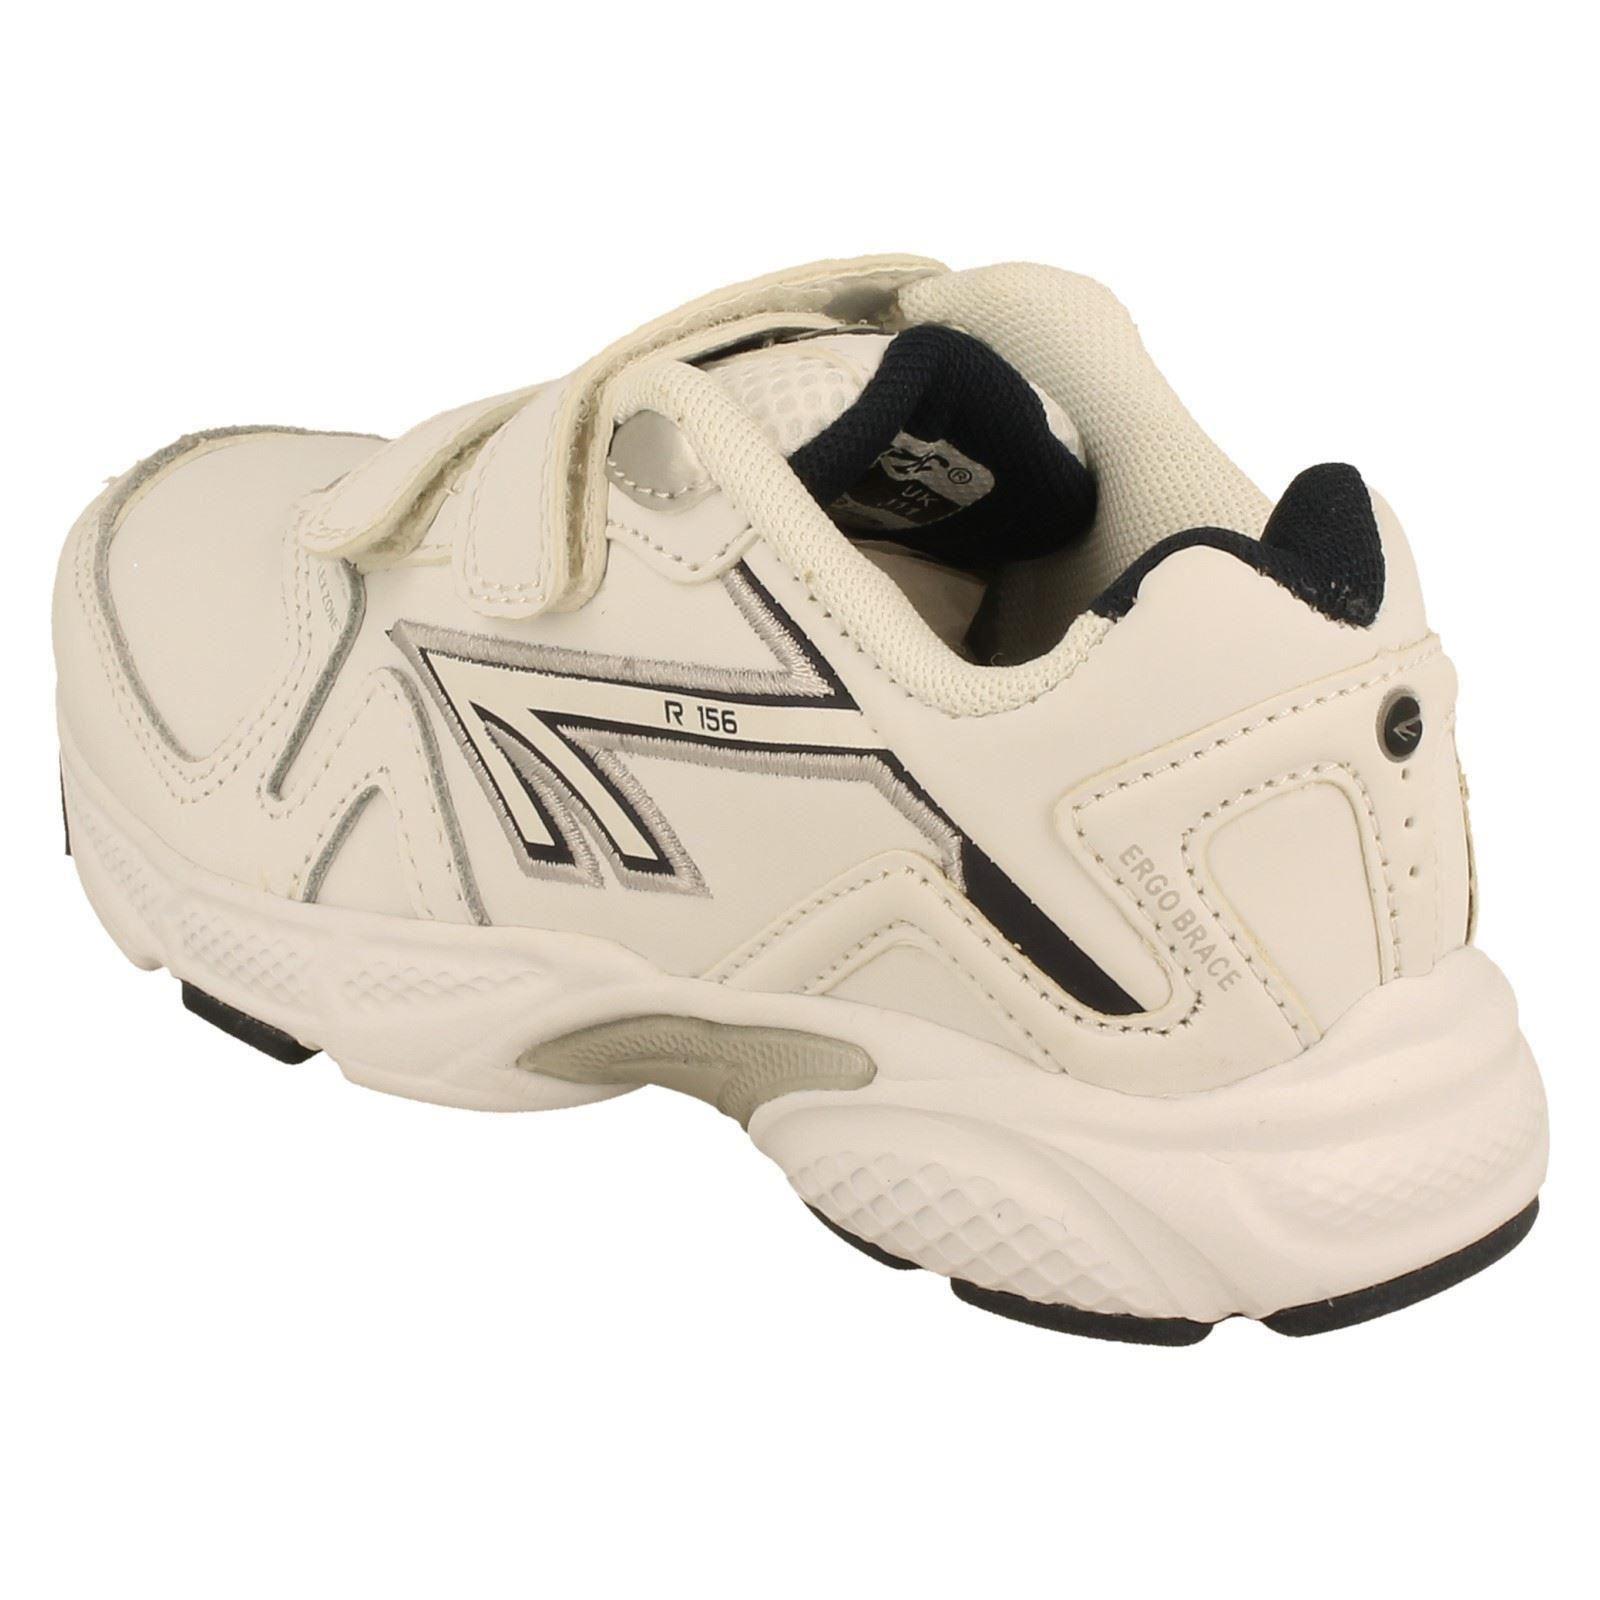 Boys Hi-Tec Trainers Style R156 EZ JR Leather -W